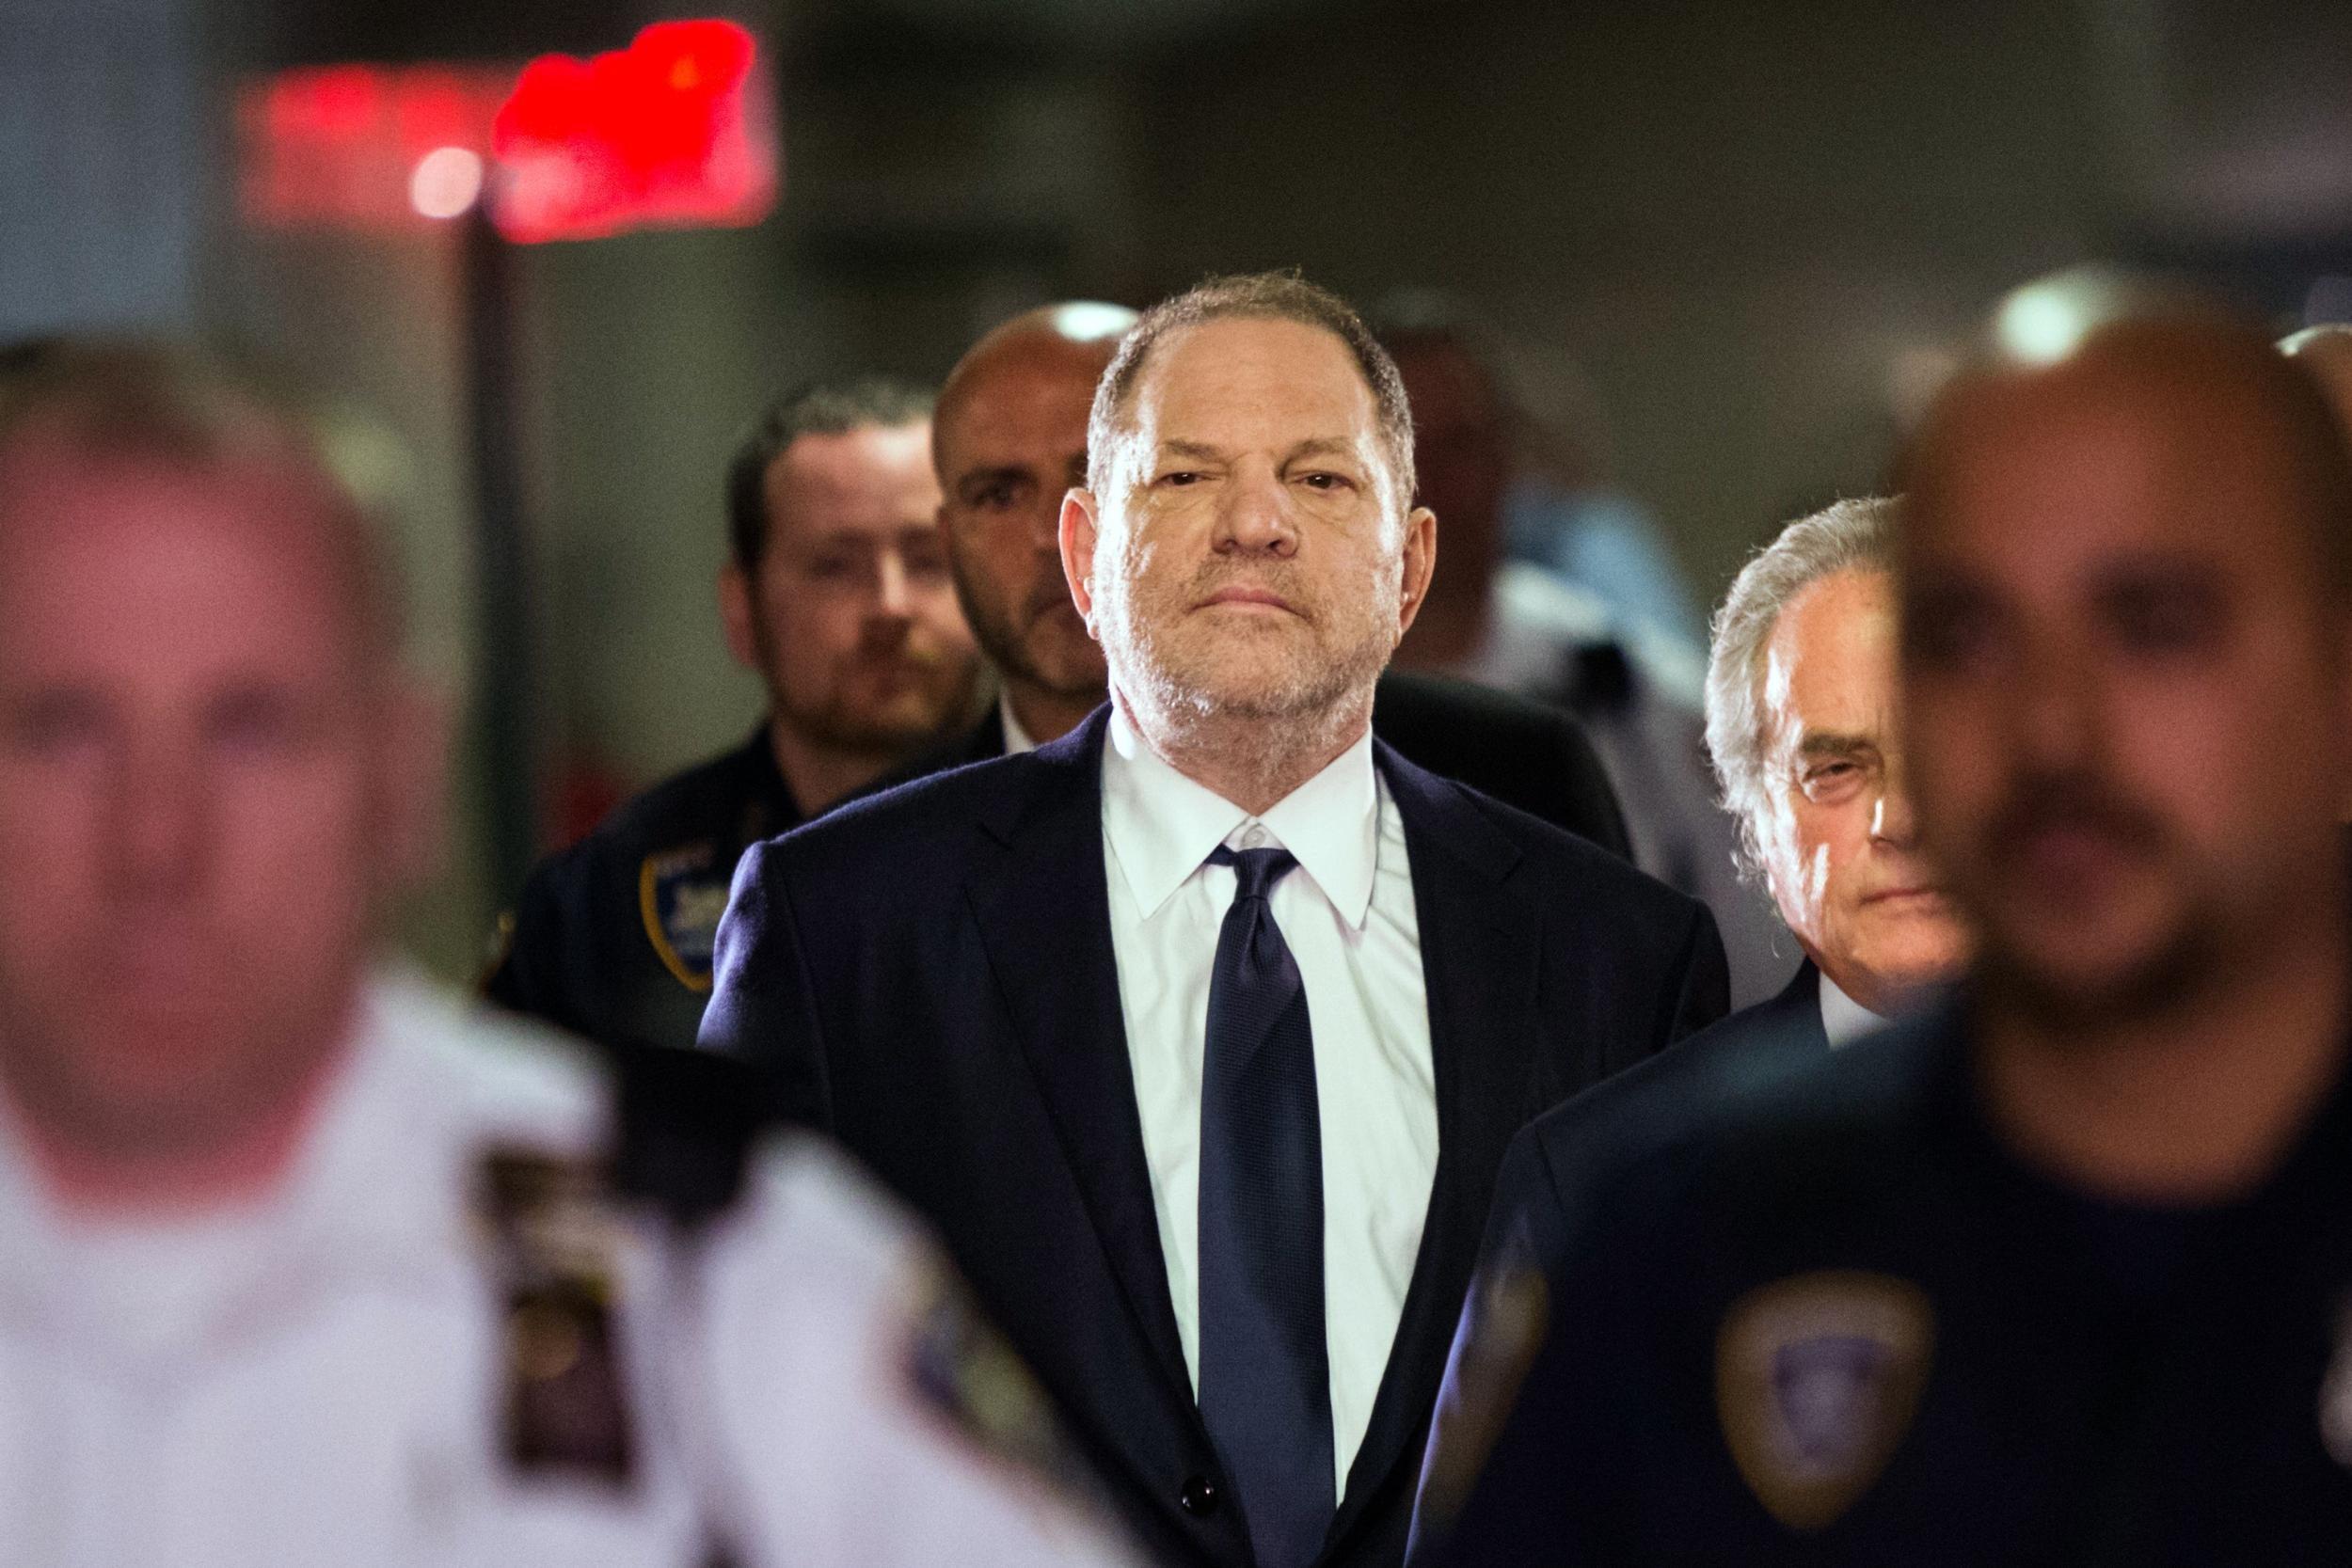 Inside the tense New York court room where Harvey Weinstein pleaded not guilty to rape